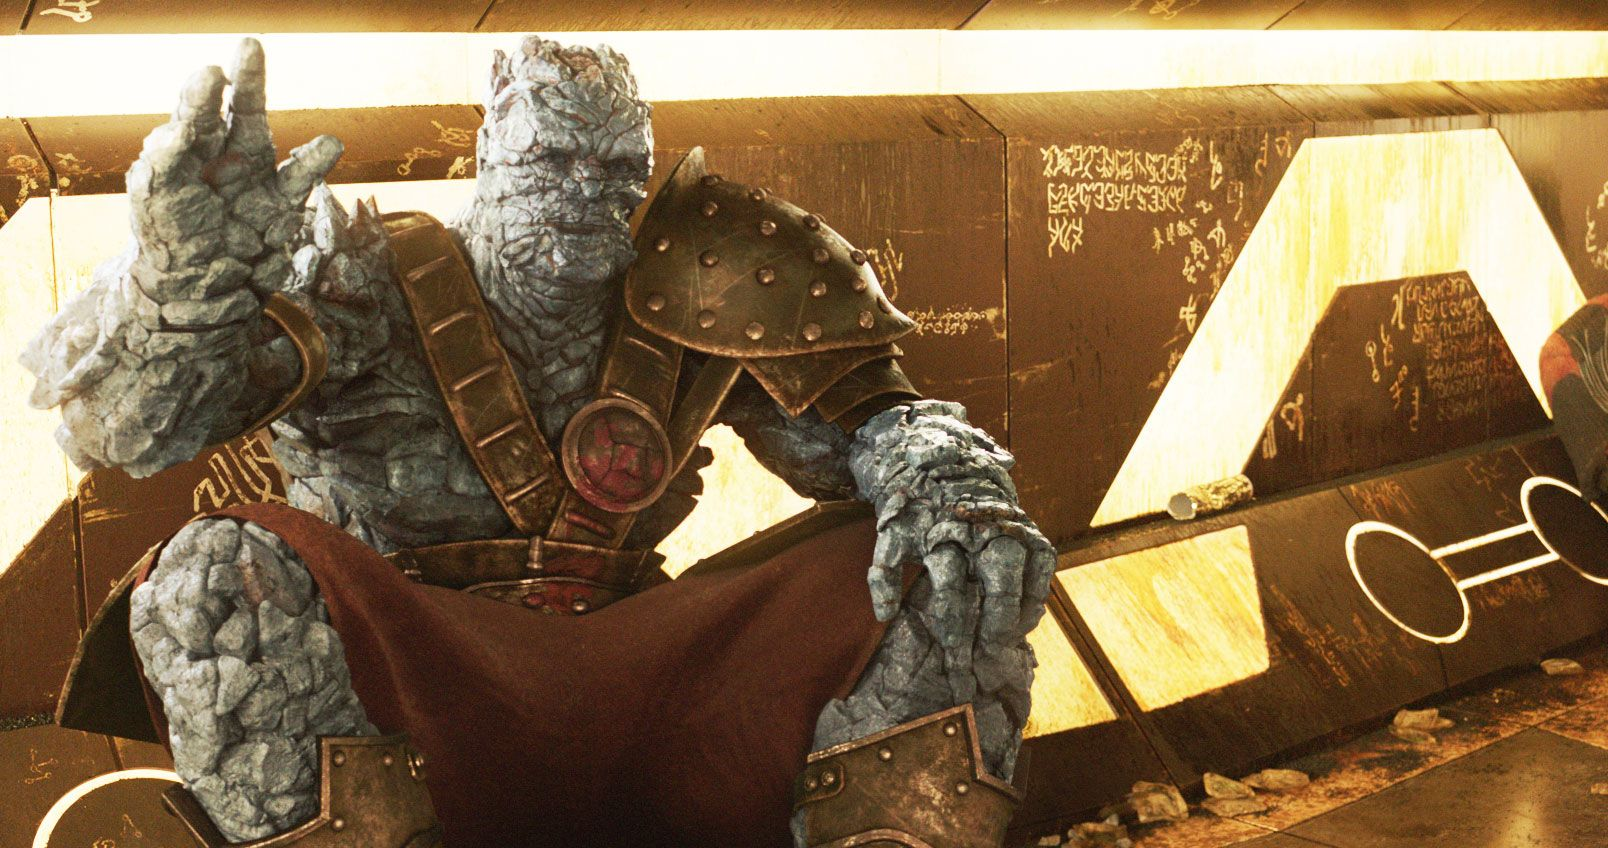 Taika Waititi Just Confirmed Korg the Kronan Will Return in 'Thor: Love & Thunder'